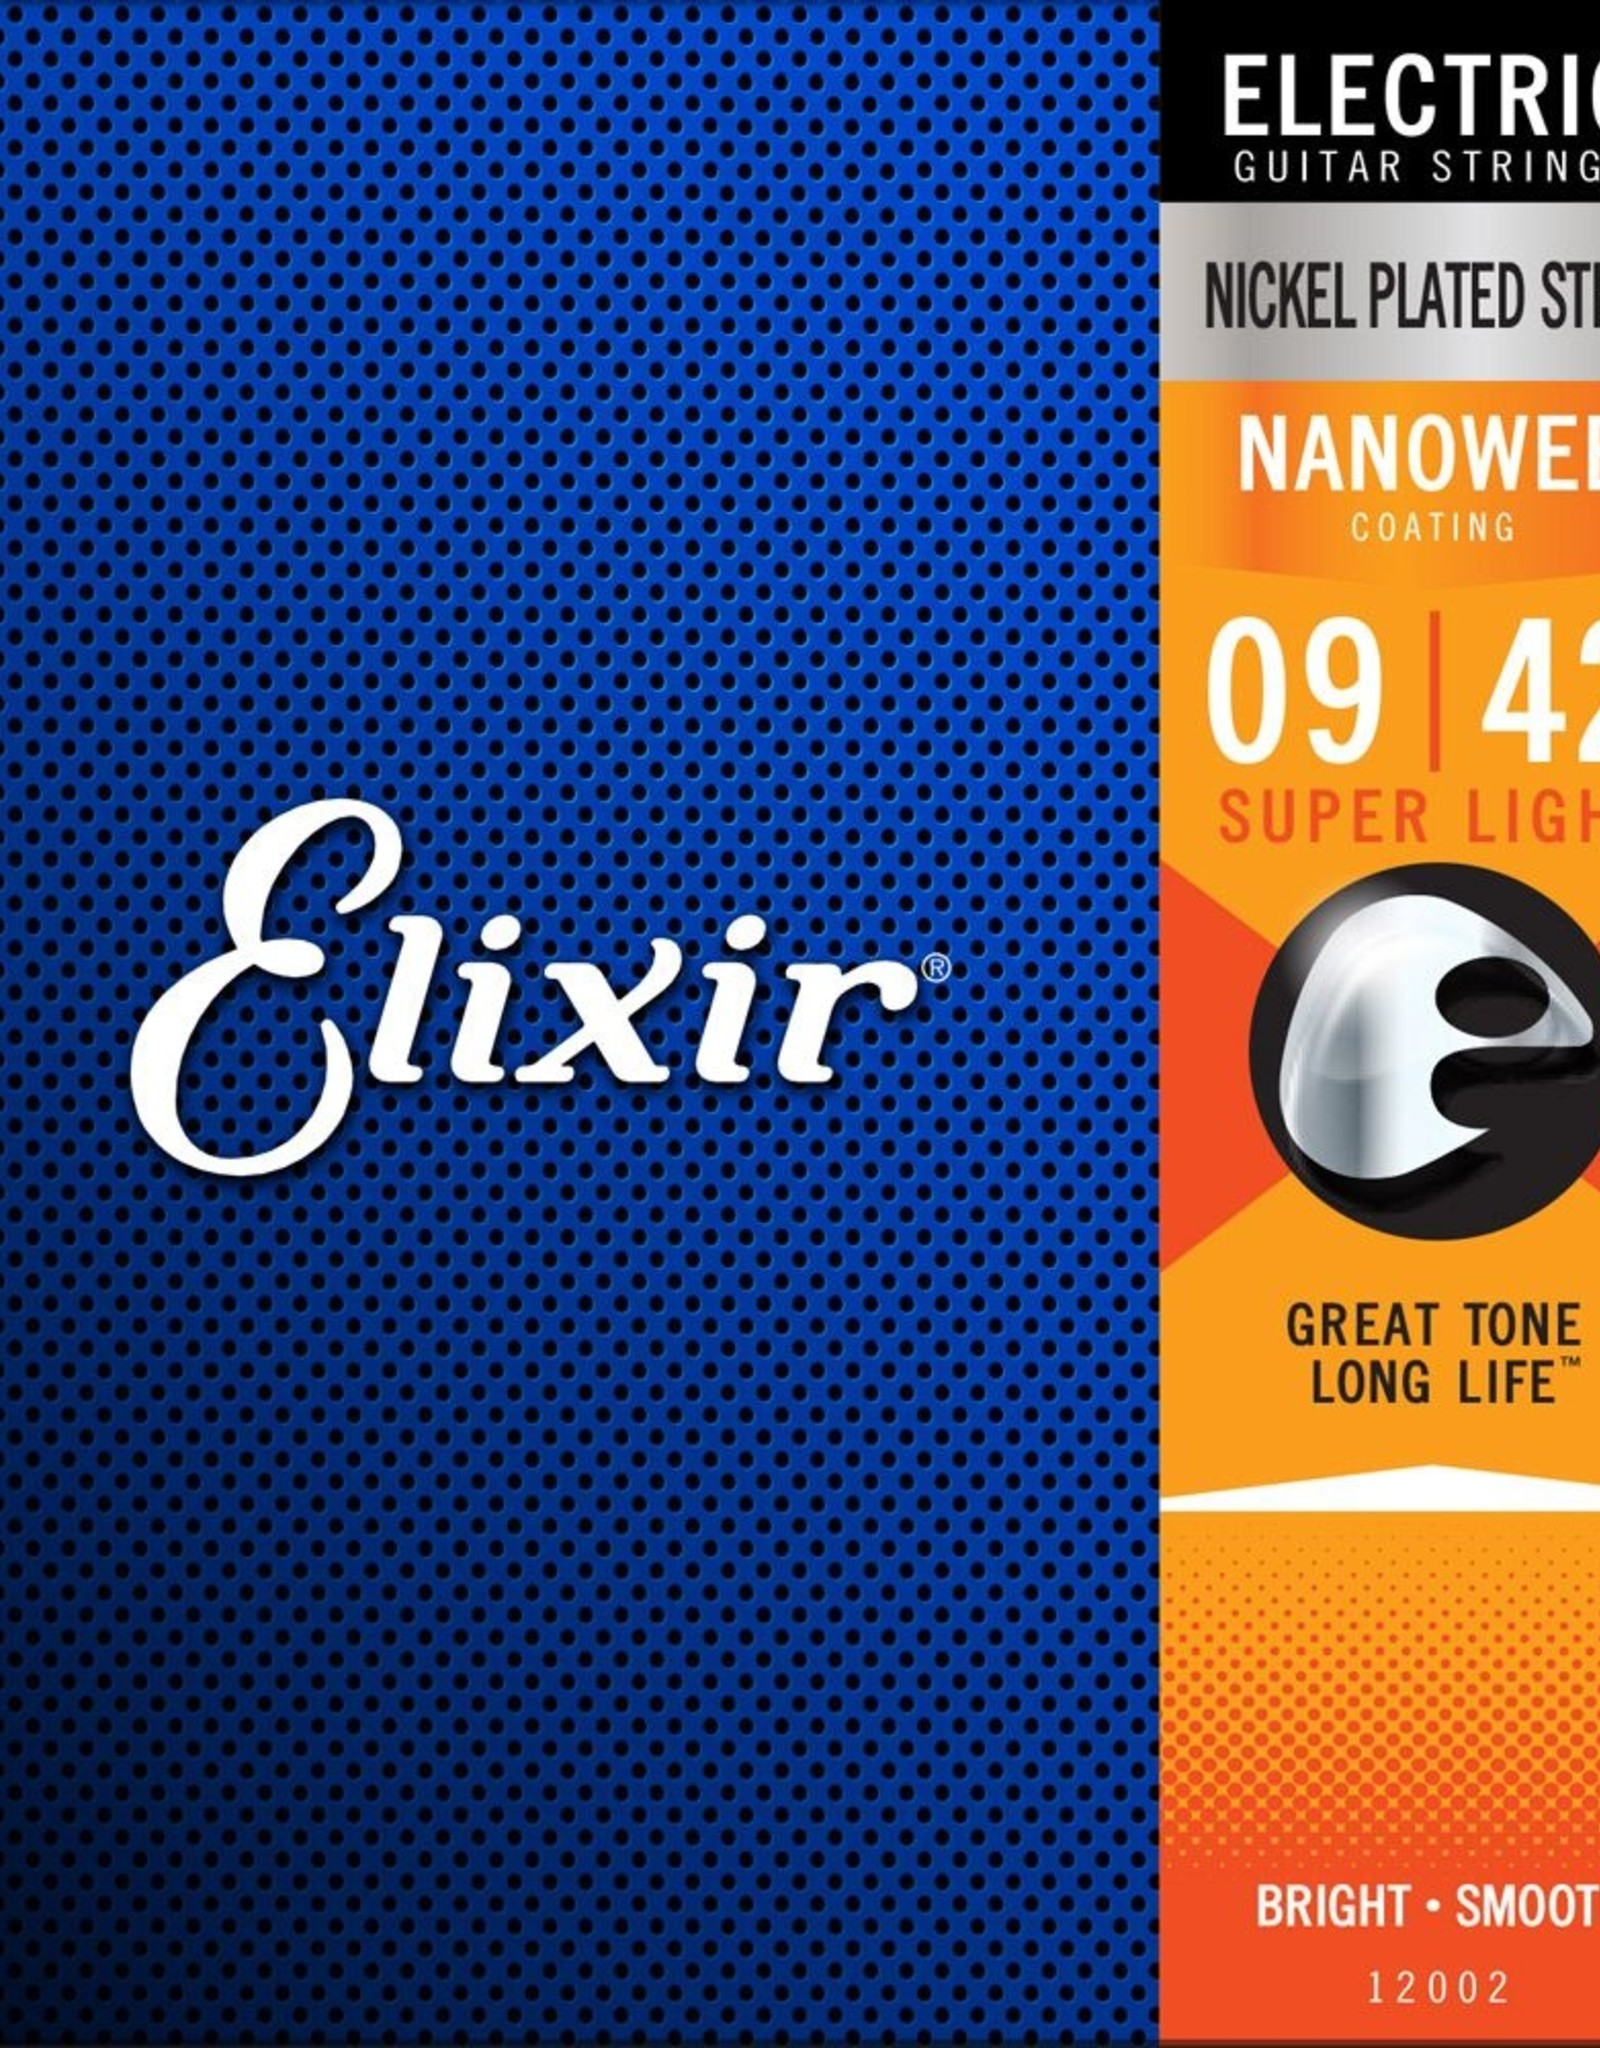 ELIXIR Elixir Nanoweb Electric Super Lights, 9-42